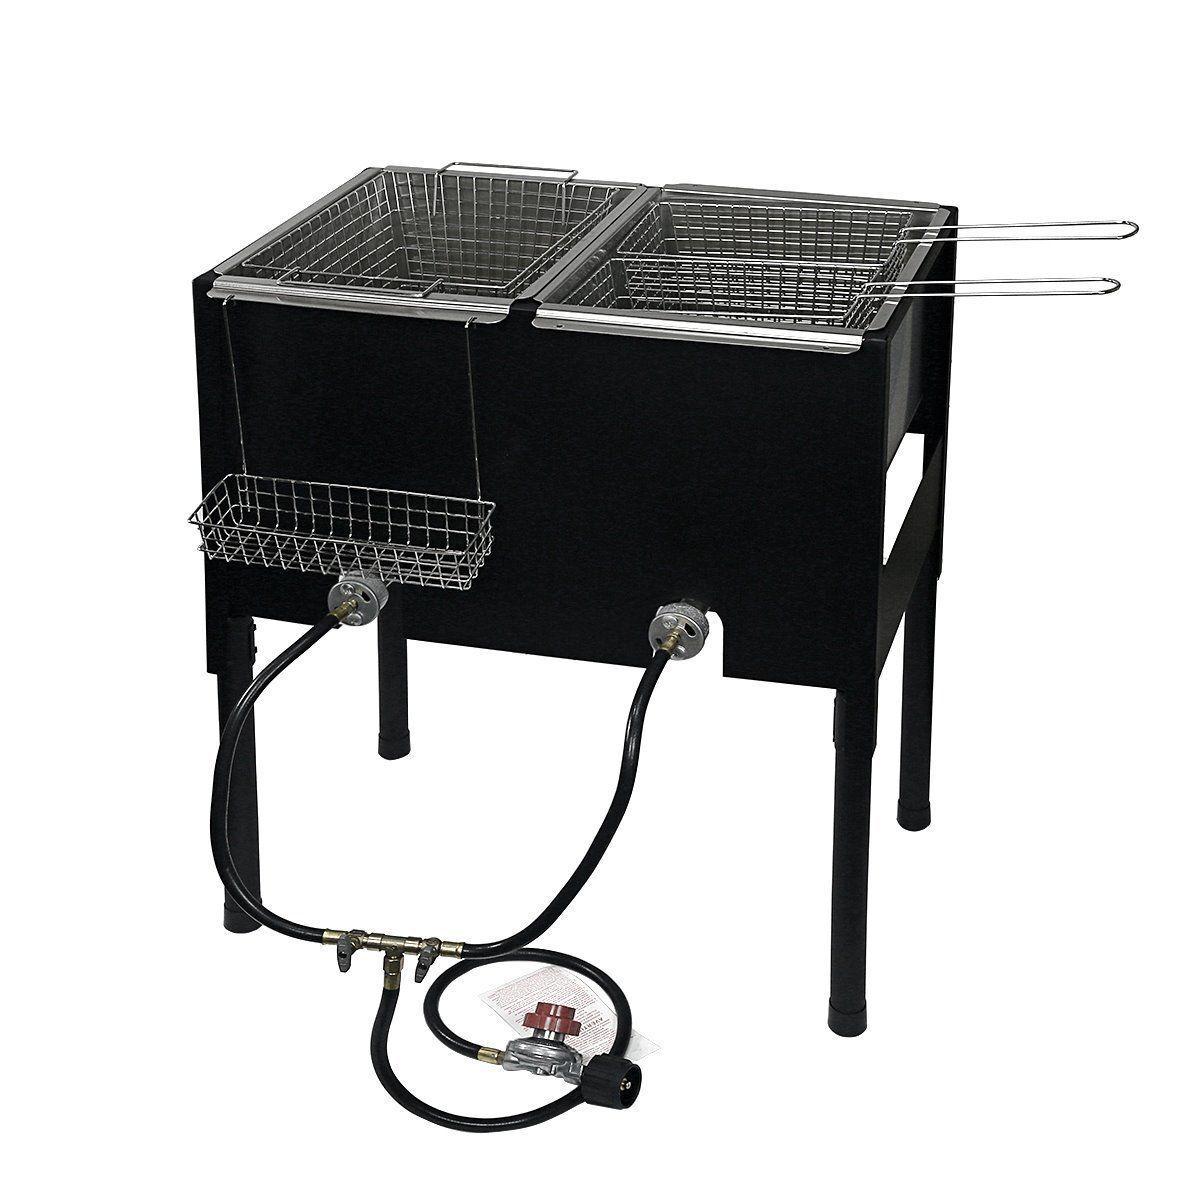 Propane LPG Camping Stove 2 Burner basket Gas Double Deep